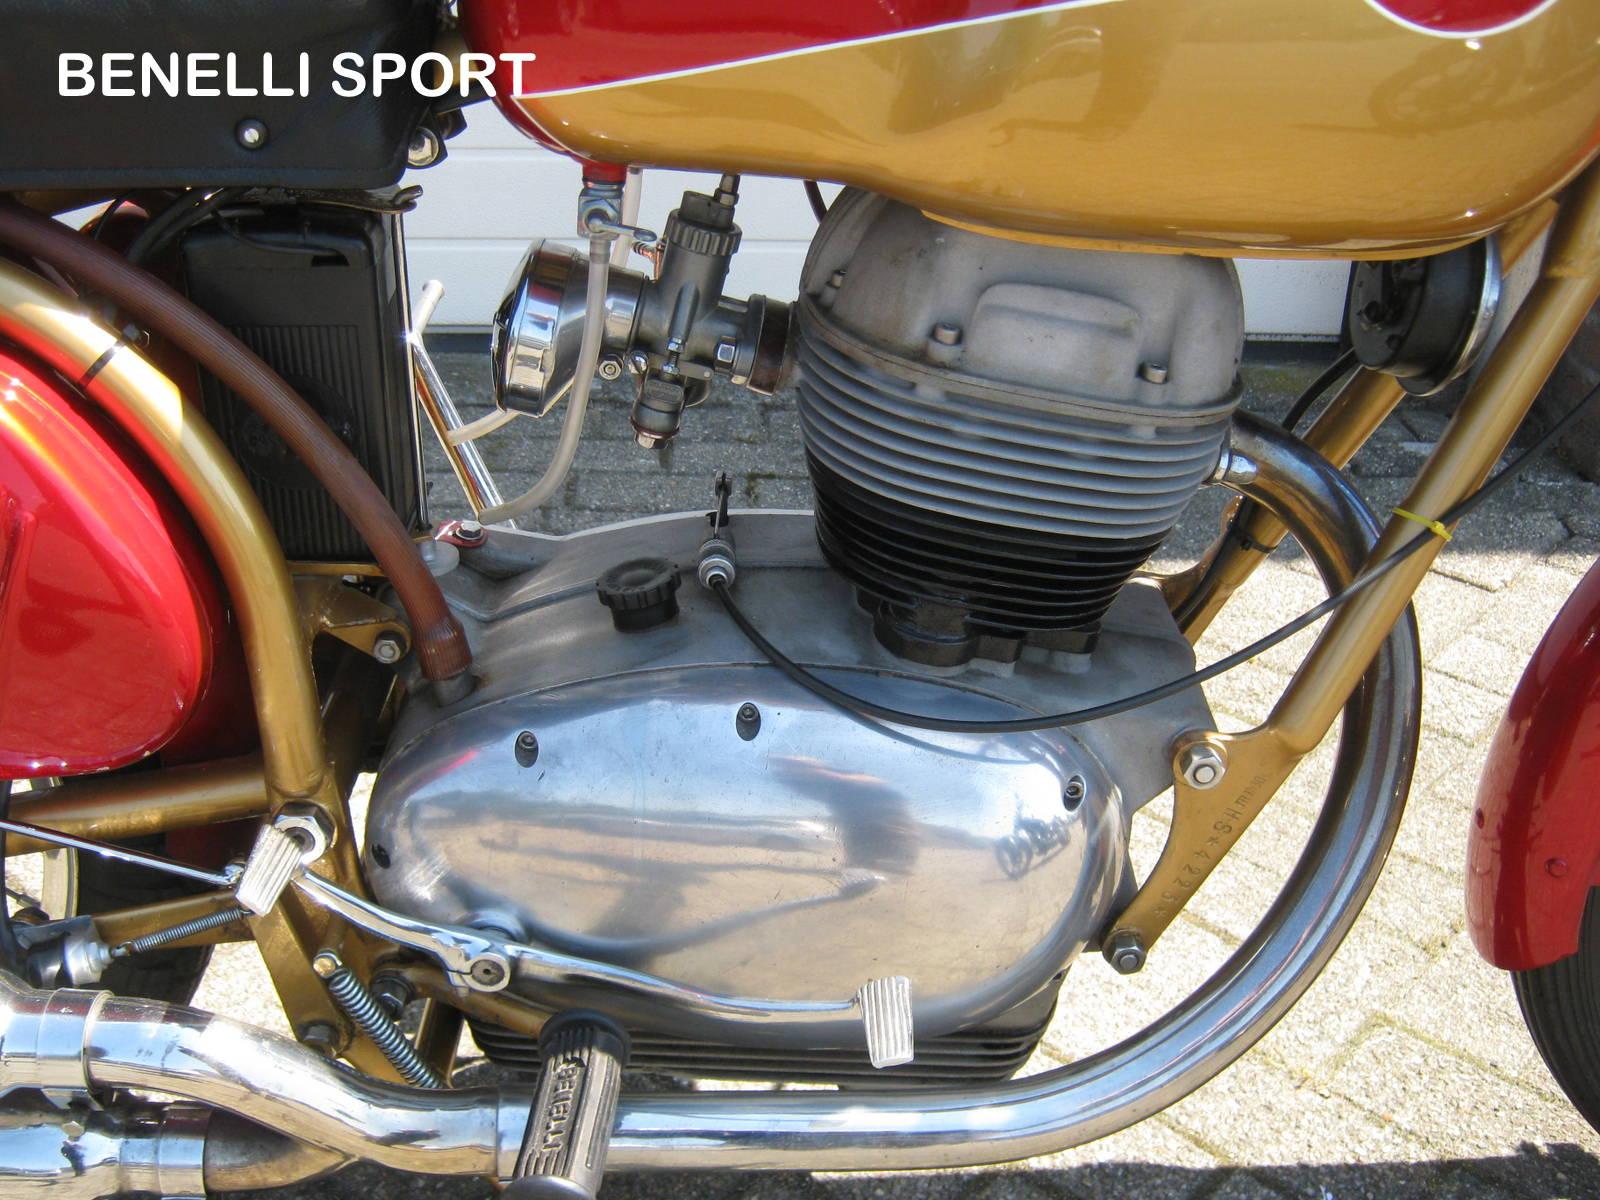 Benelli Sport